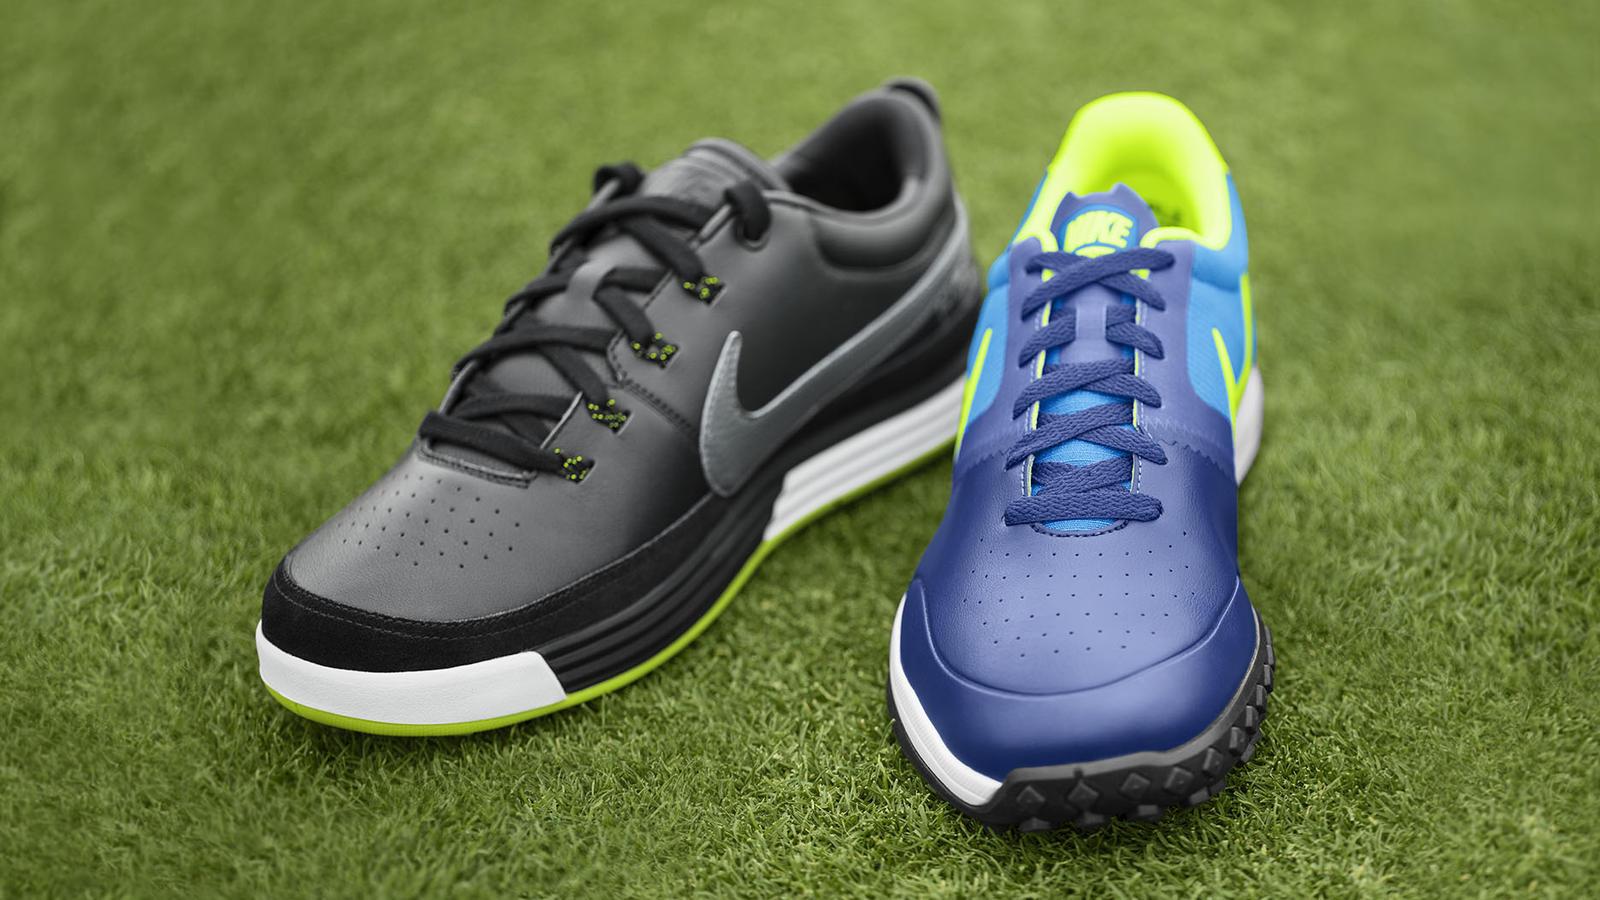 Nike Golf Versatility Footwear